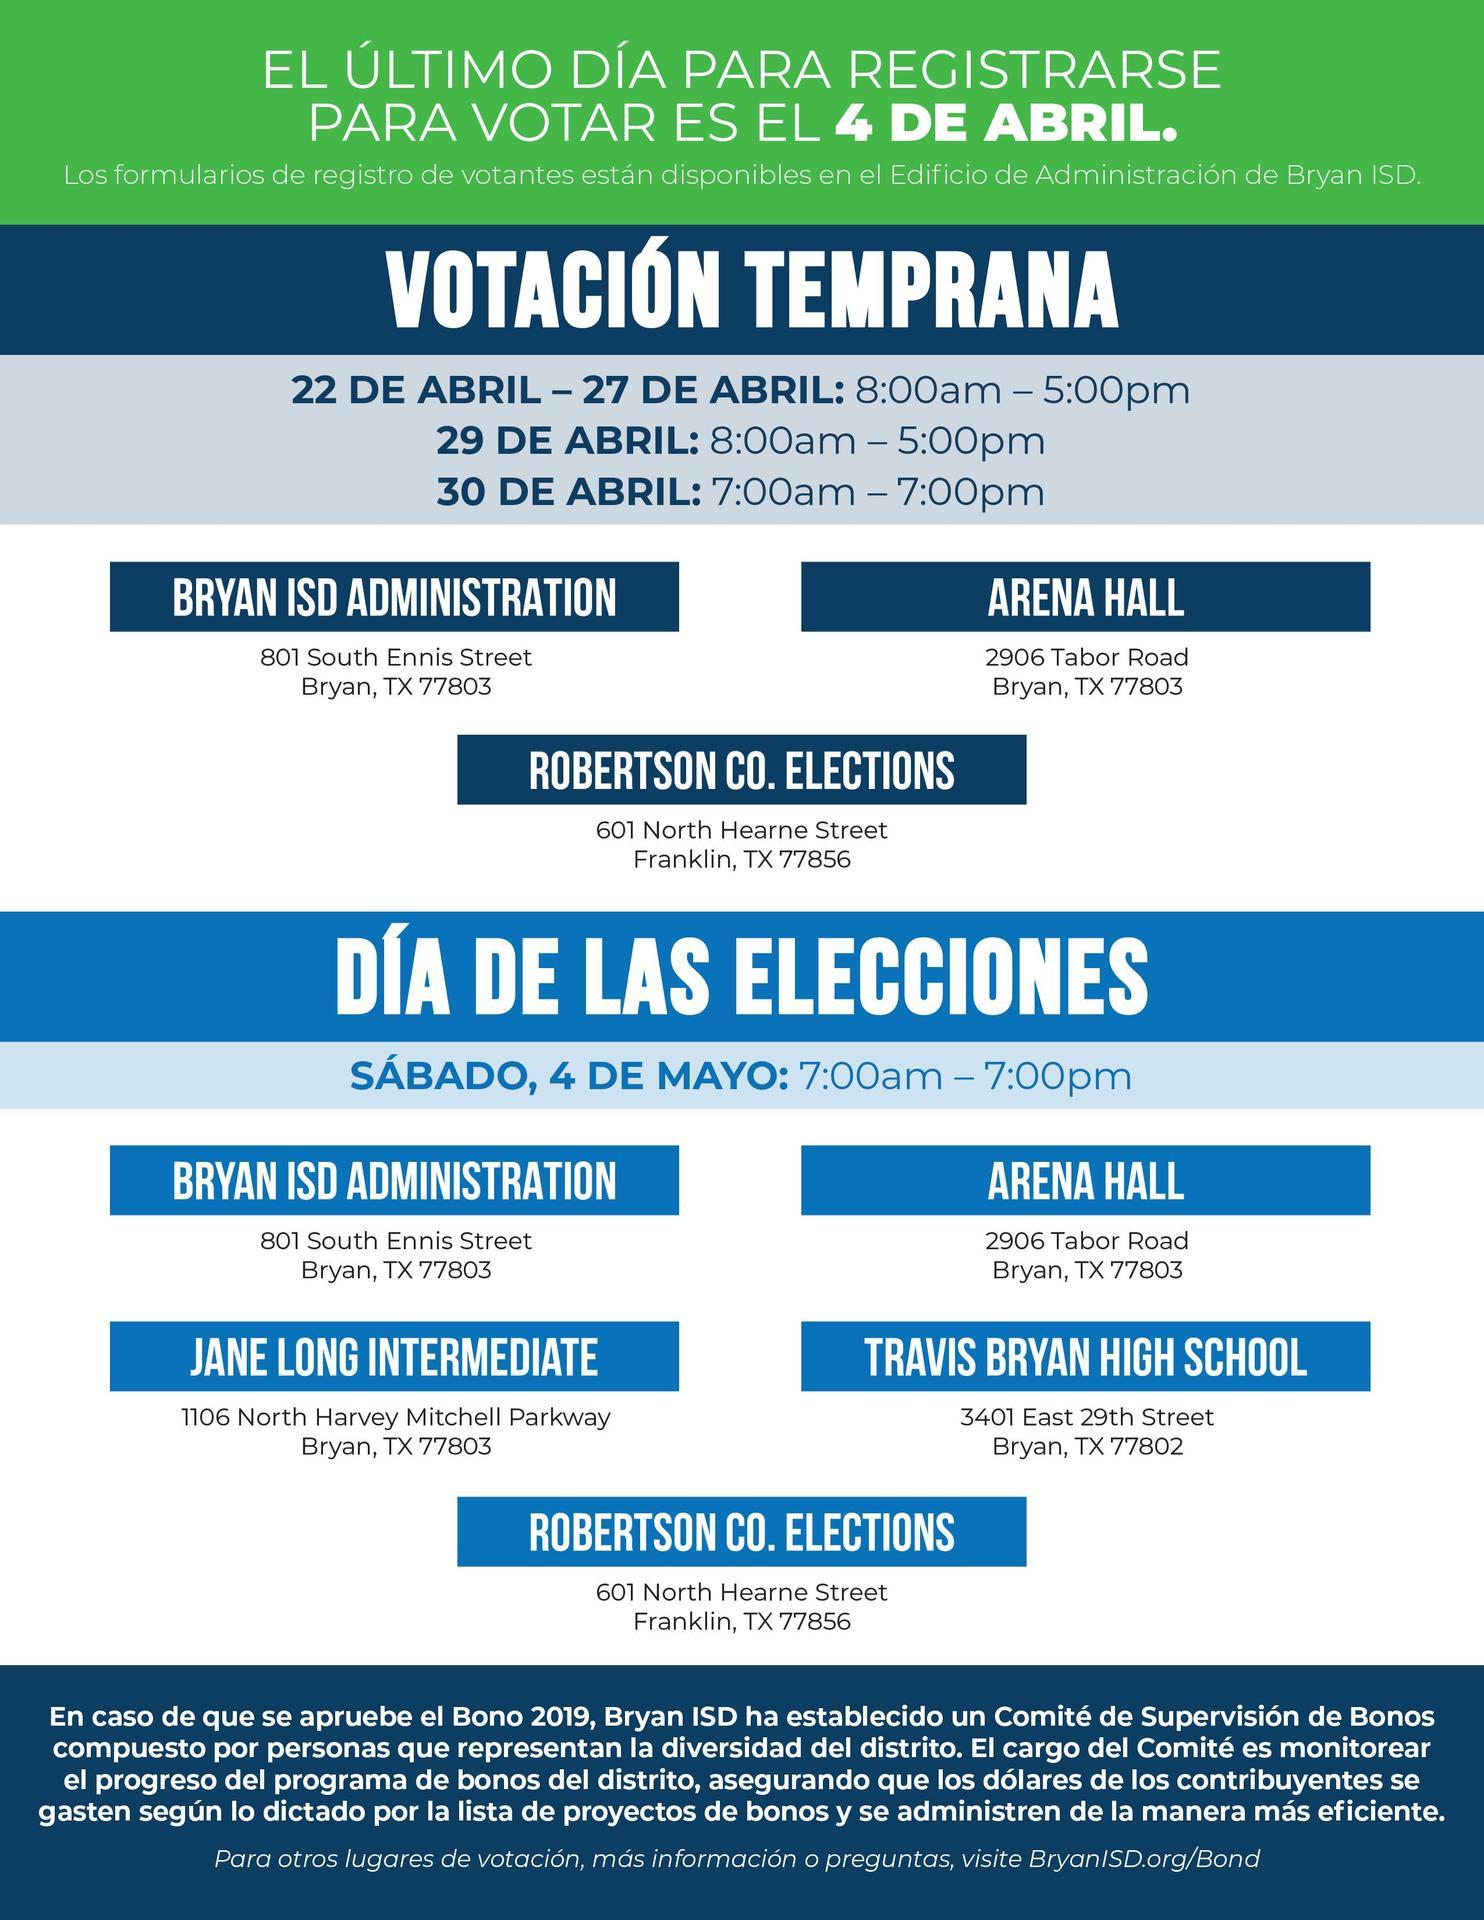 Voting Information in Spanish